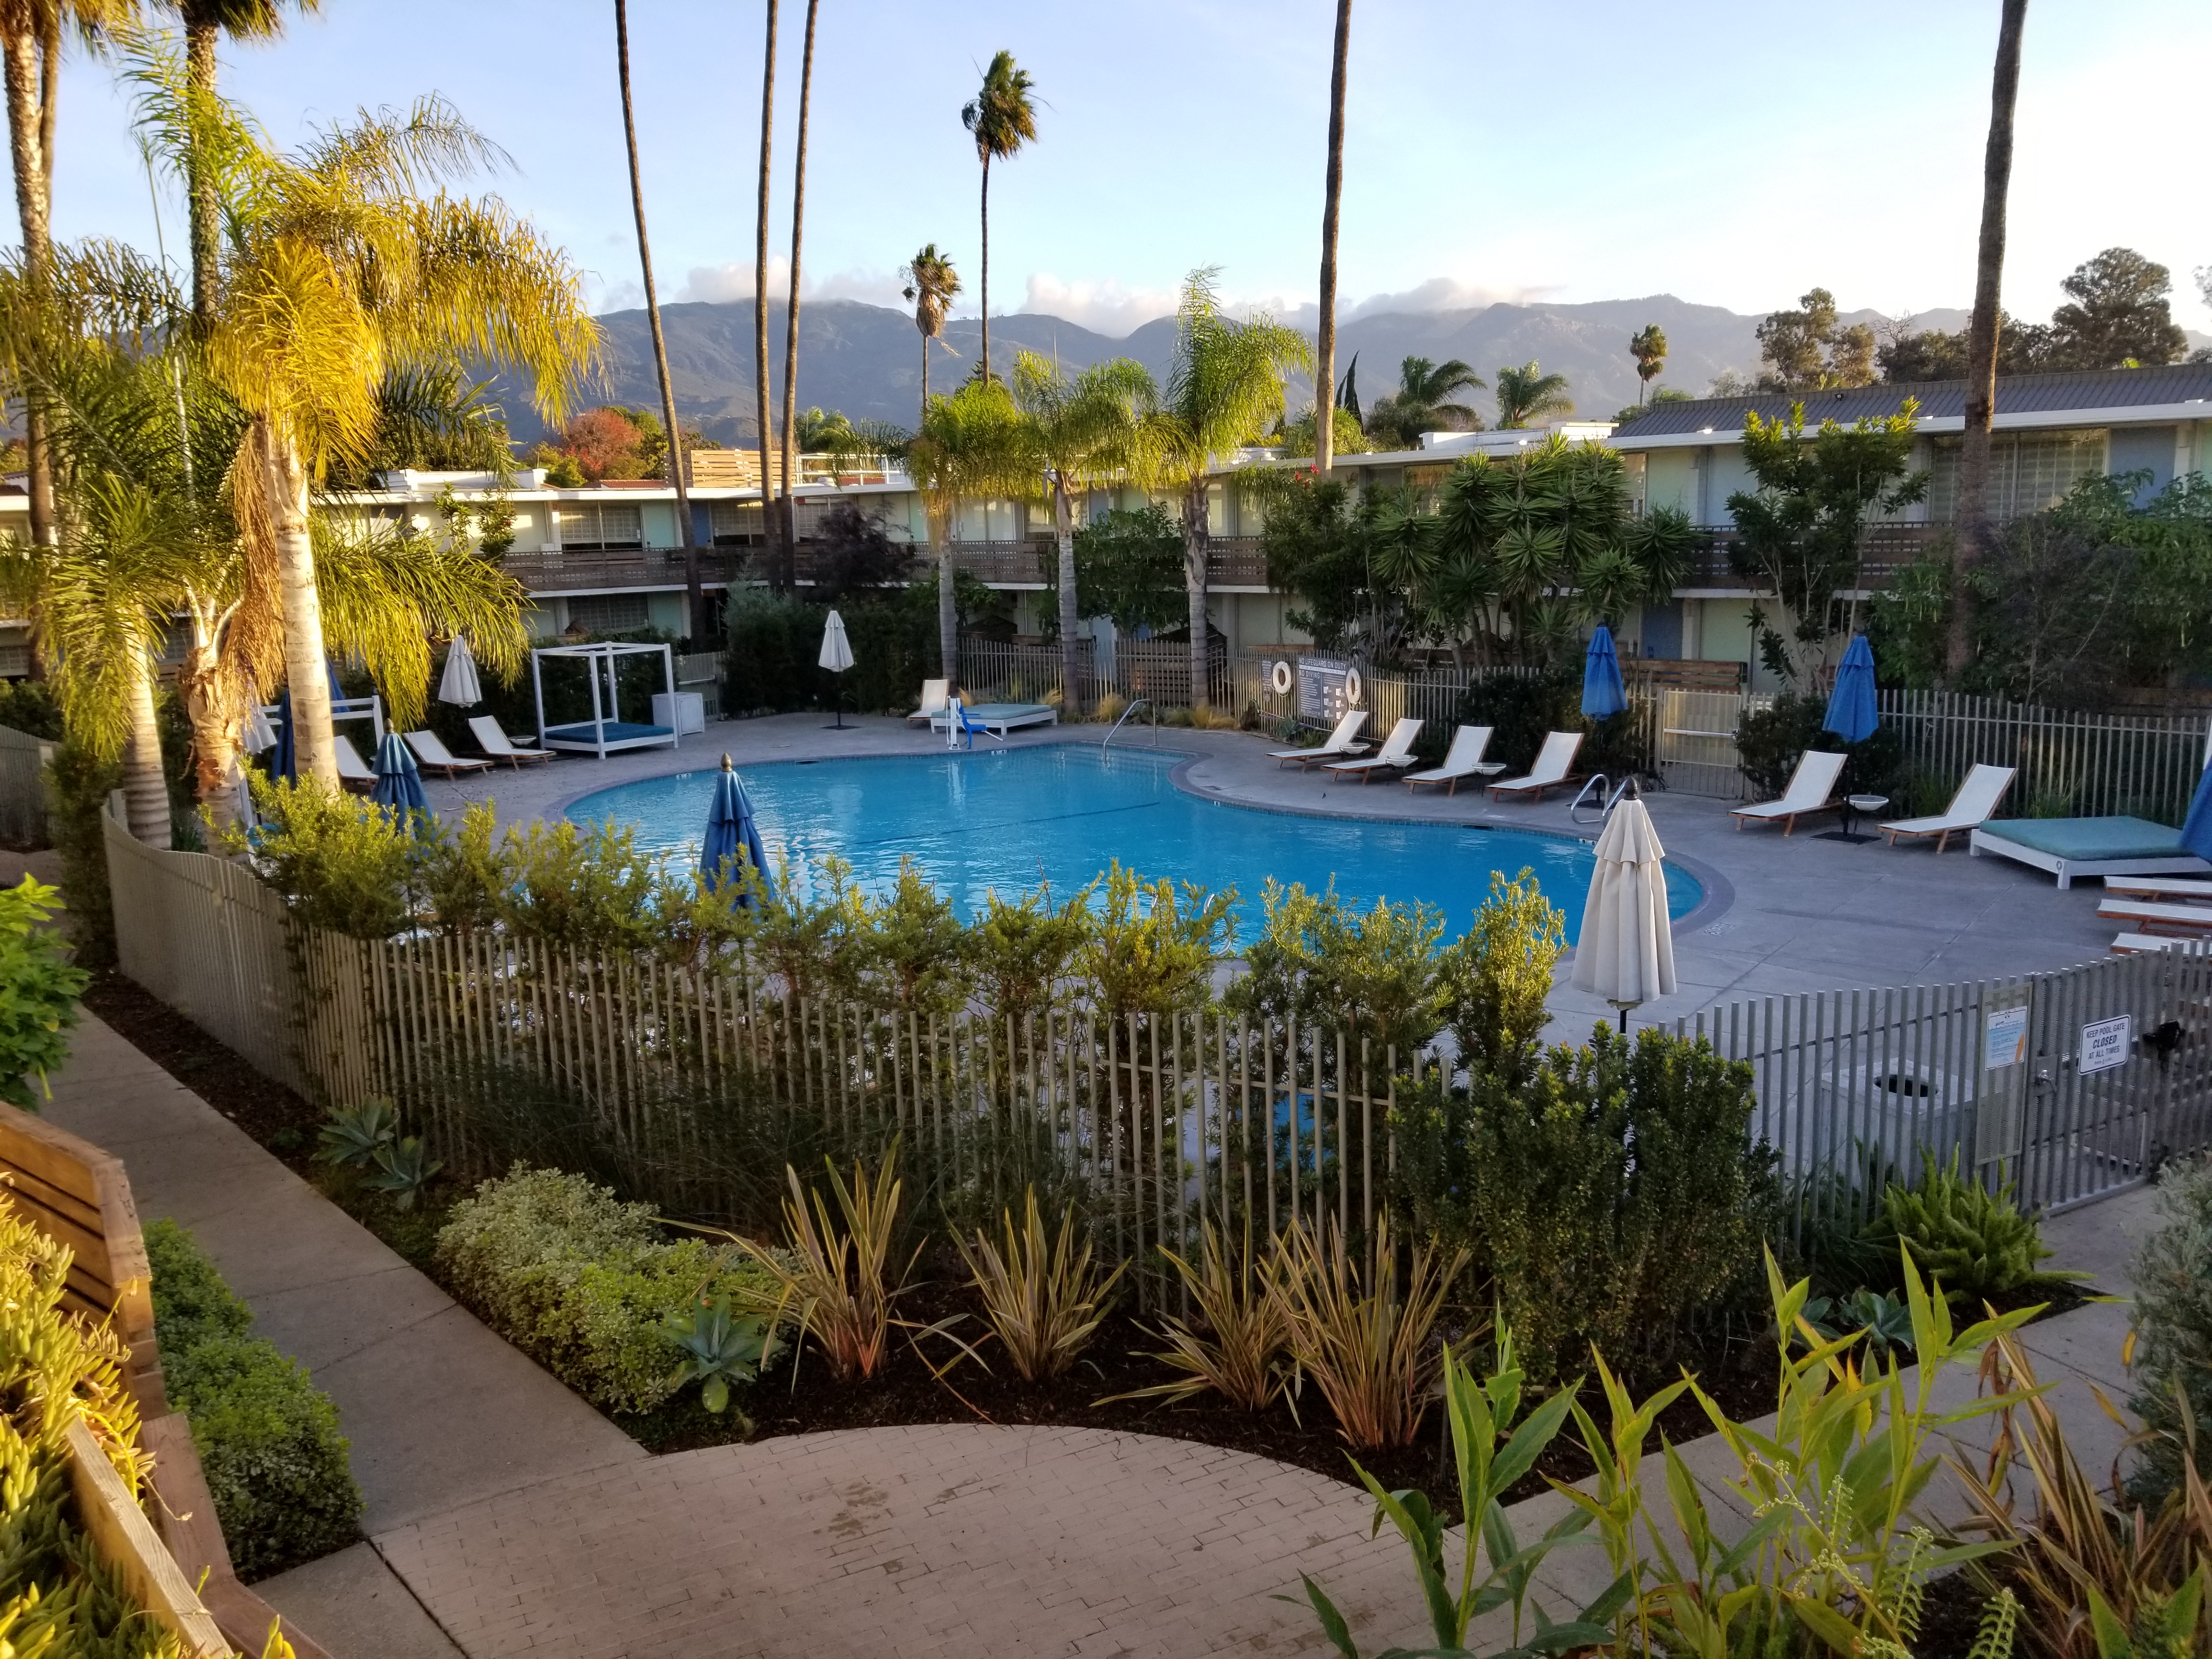 Goodland pool